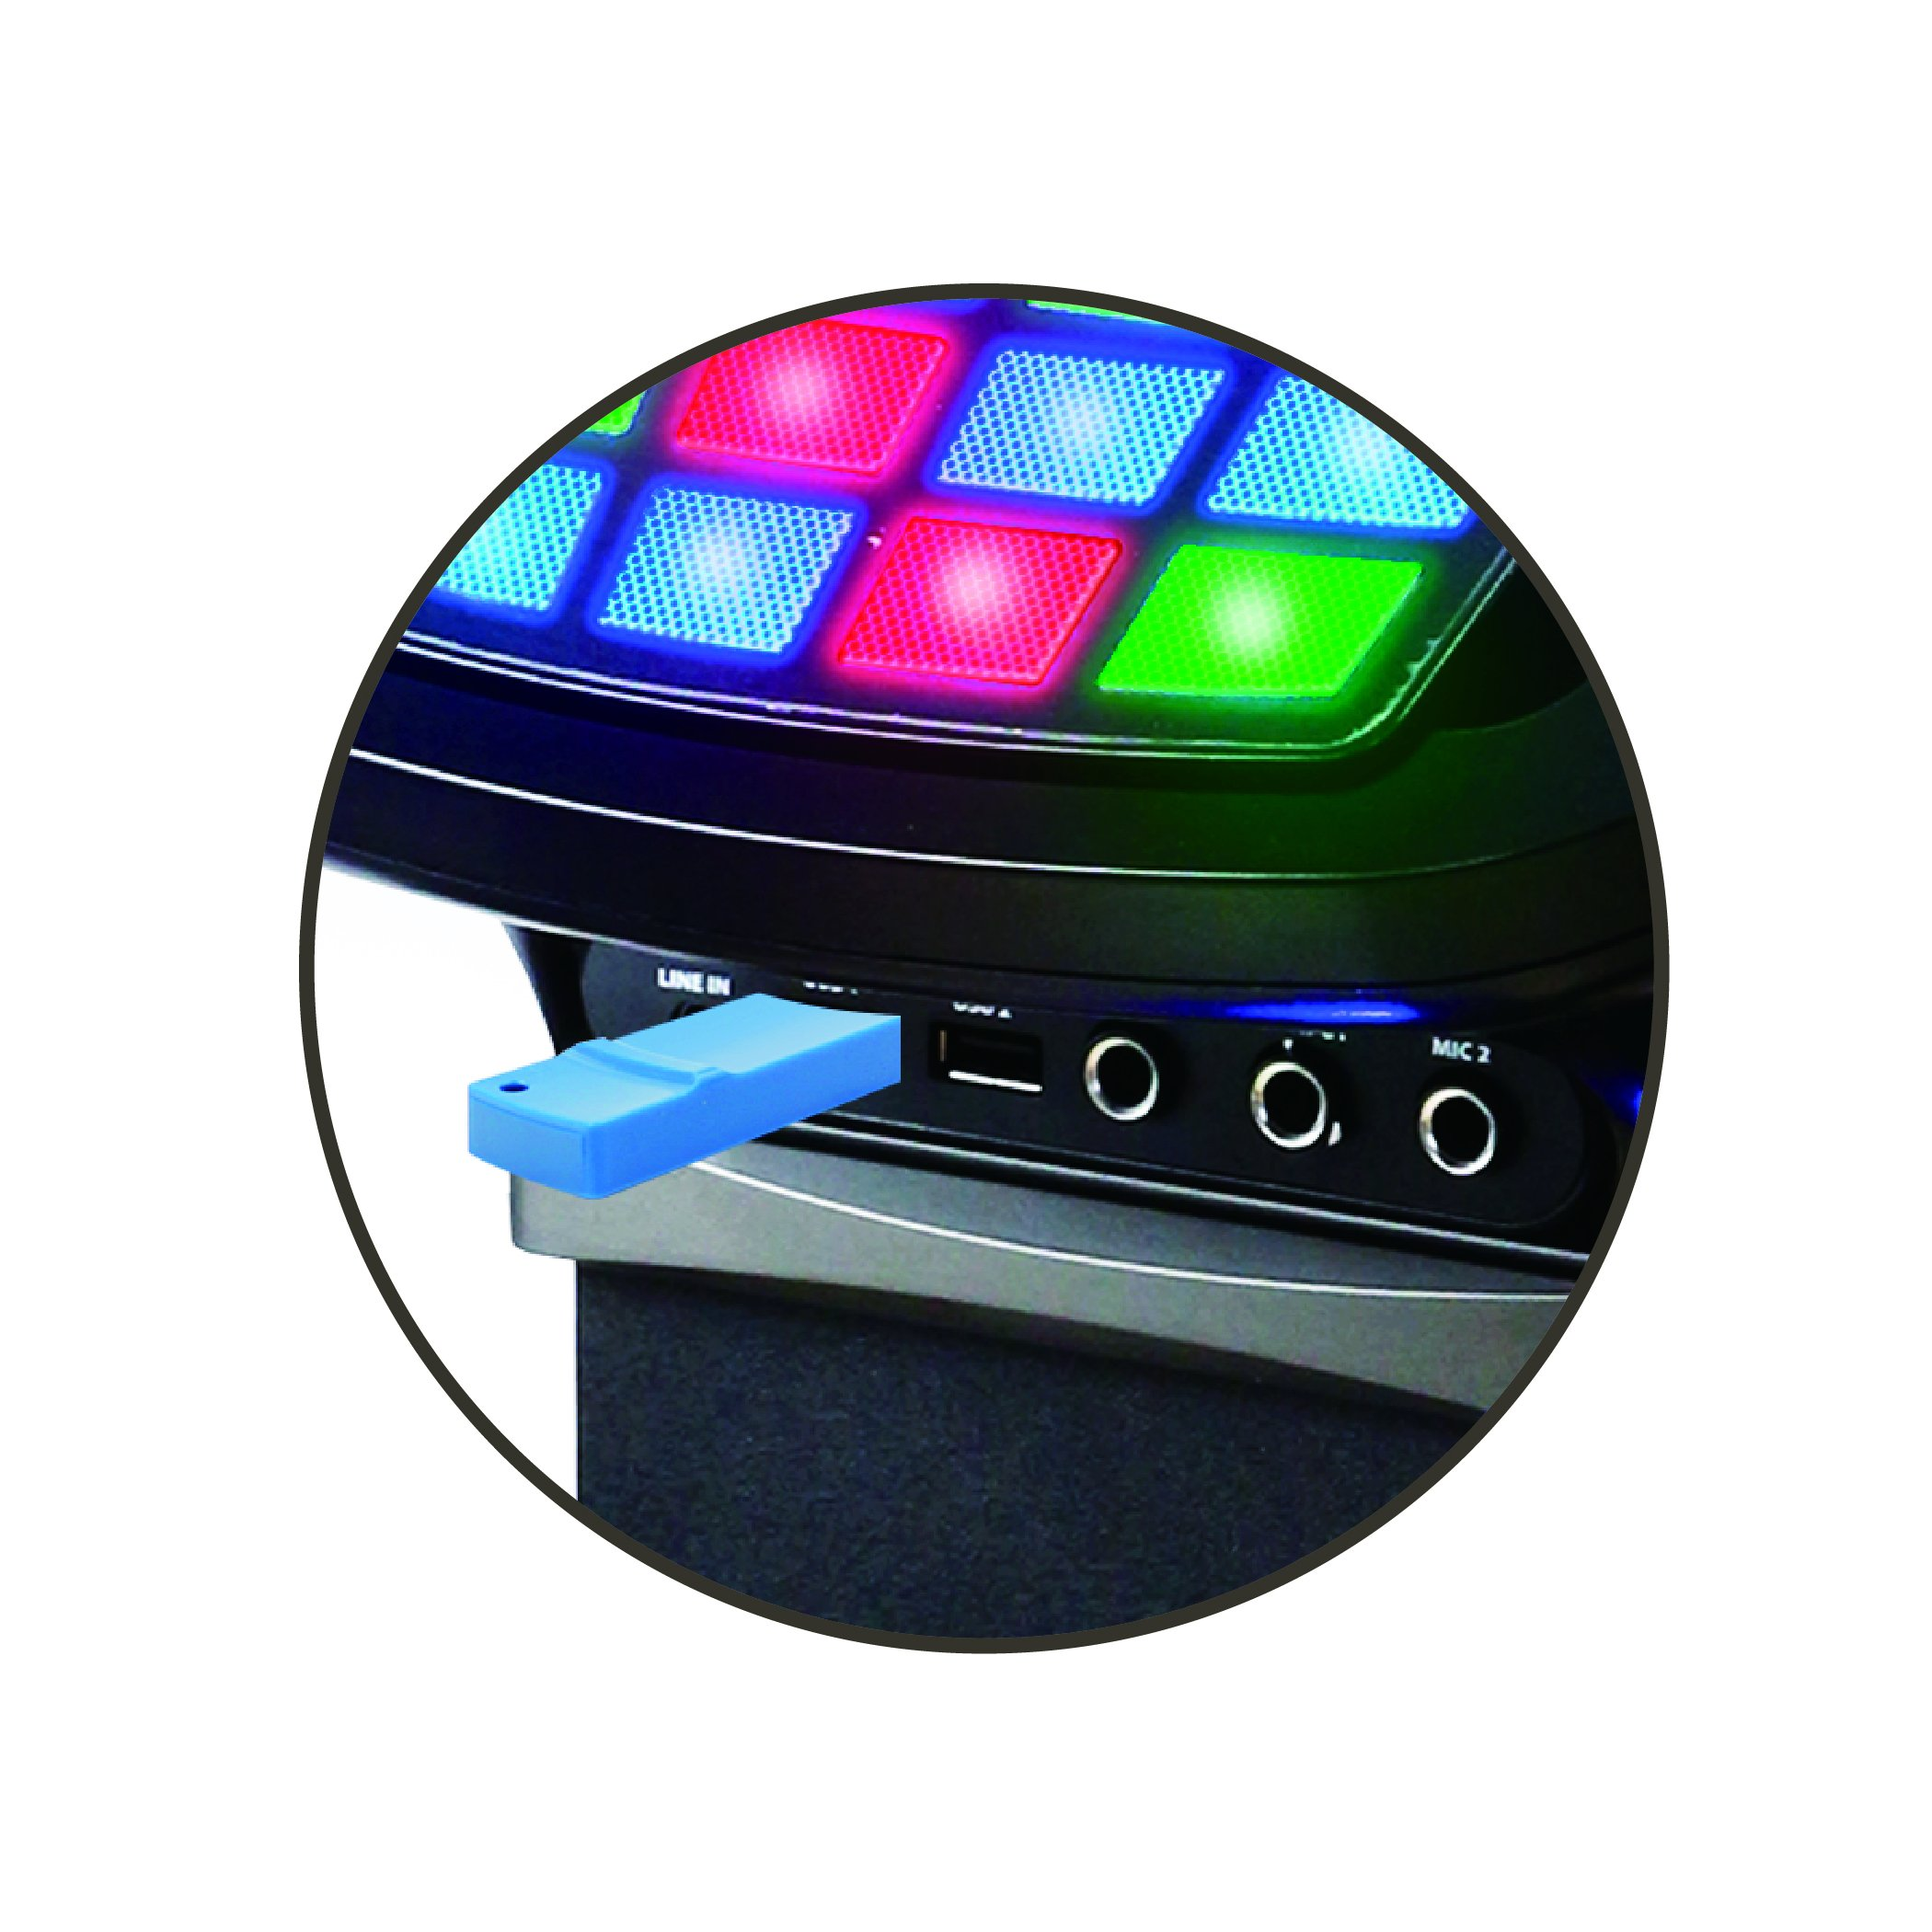 Akai KS878-BT Bluetooth Pedestal CD&G Karaoke System, Black by Akai (Image #5)